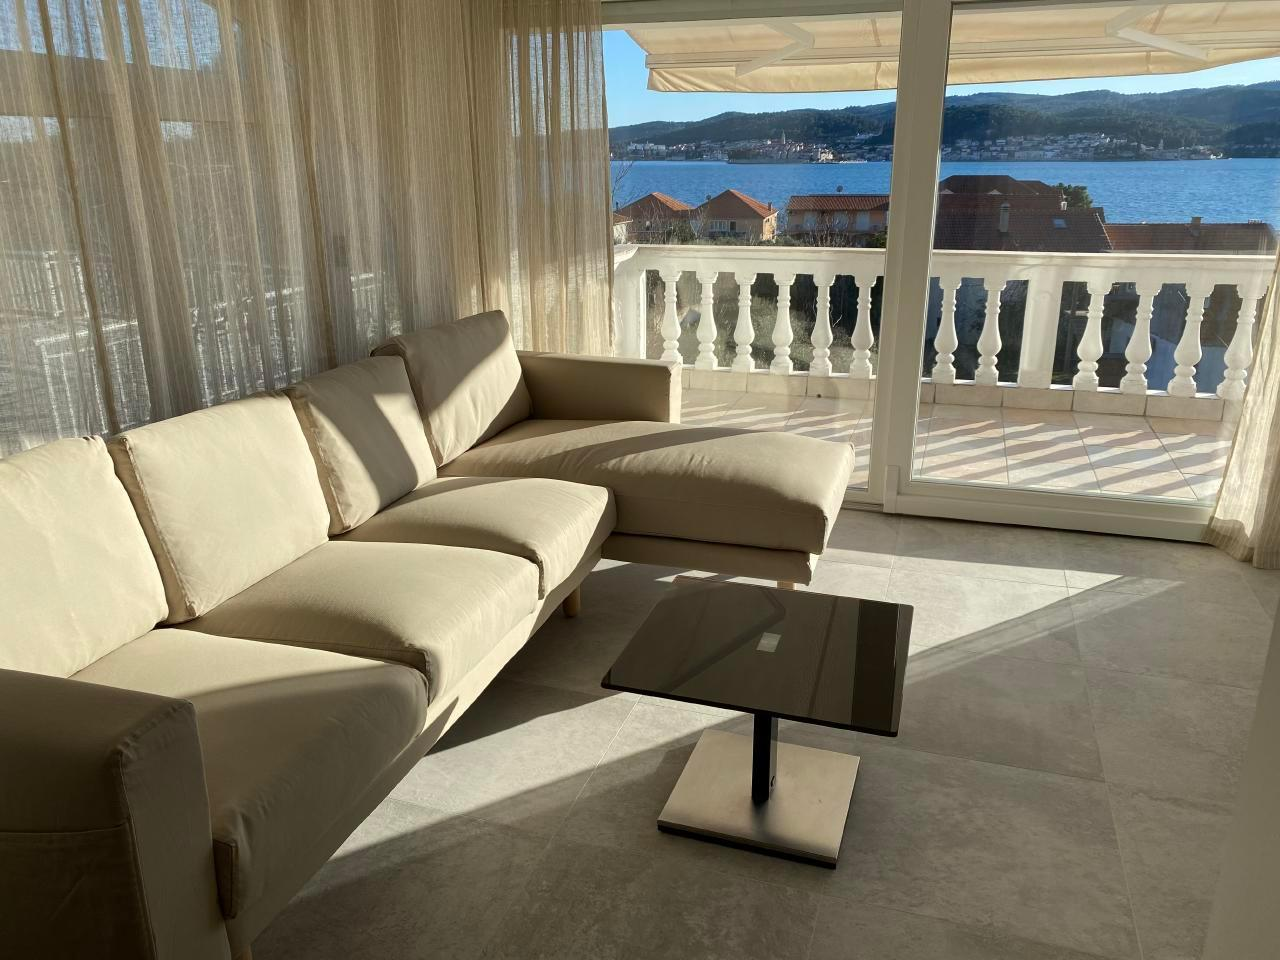 Ferienwohnung Casa Anica Apartment Bellevue (656993), Kuciste, Insel Peljesac, Dalmatien, Kroatien, Bild 12